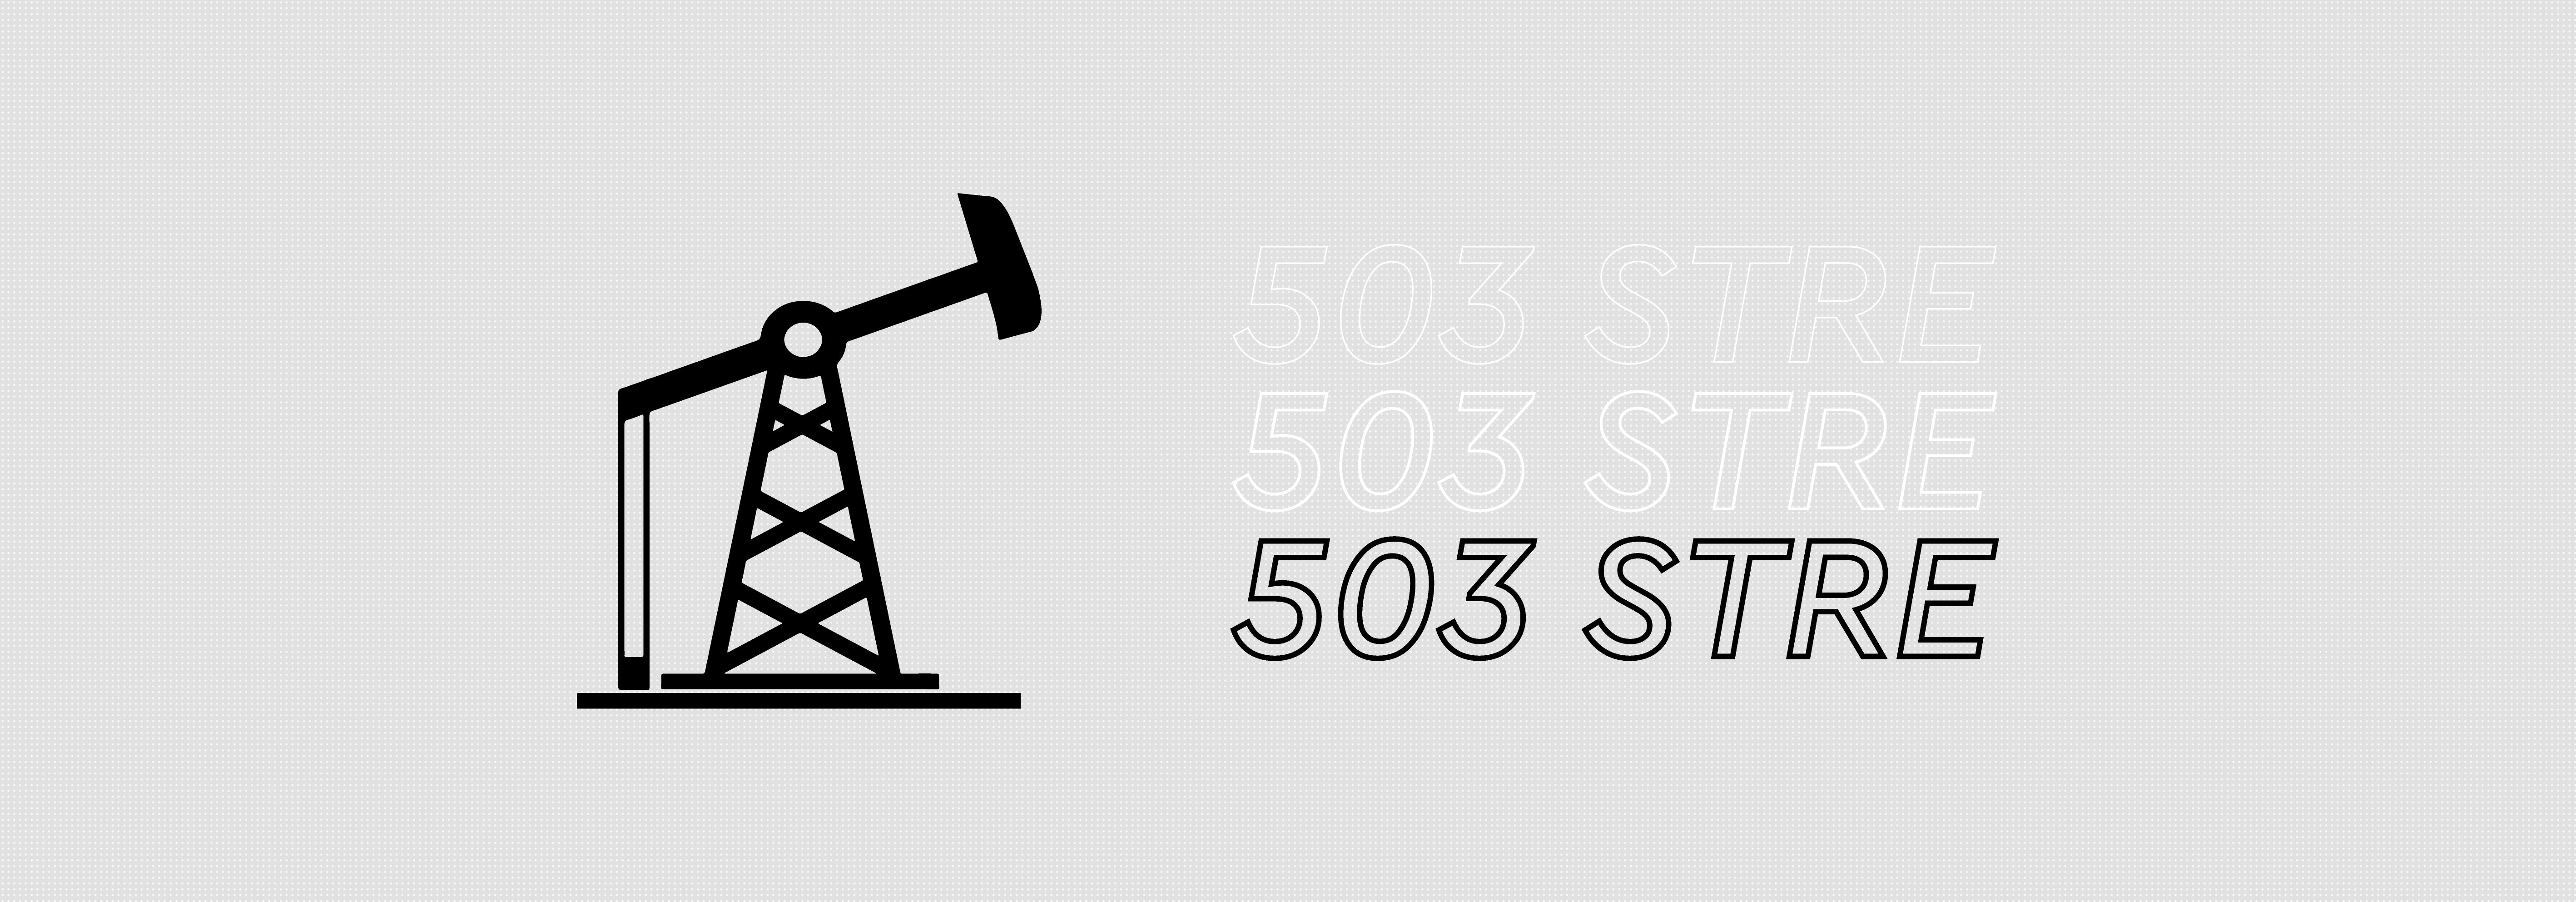 STRE 503 – Gibraltar T-Shirt